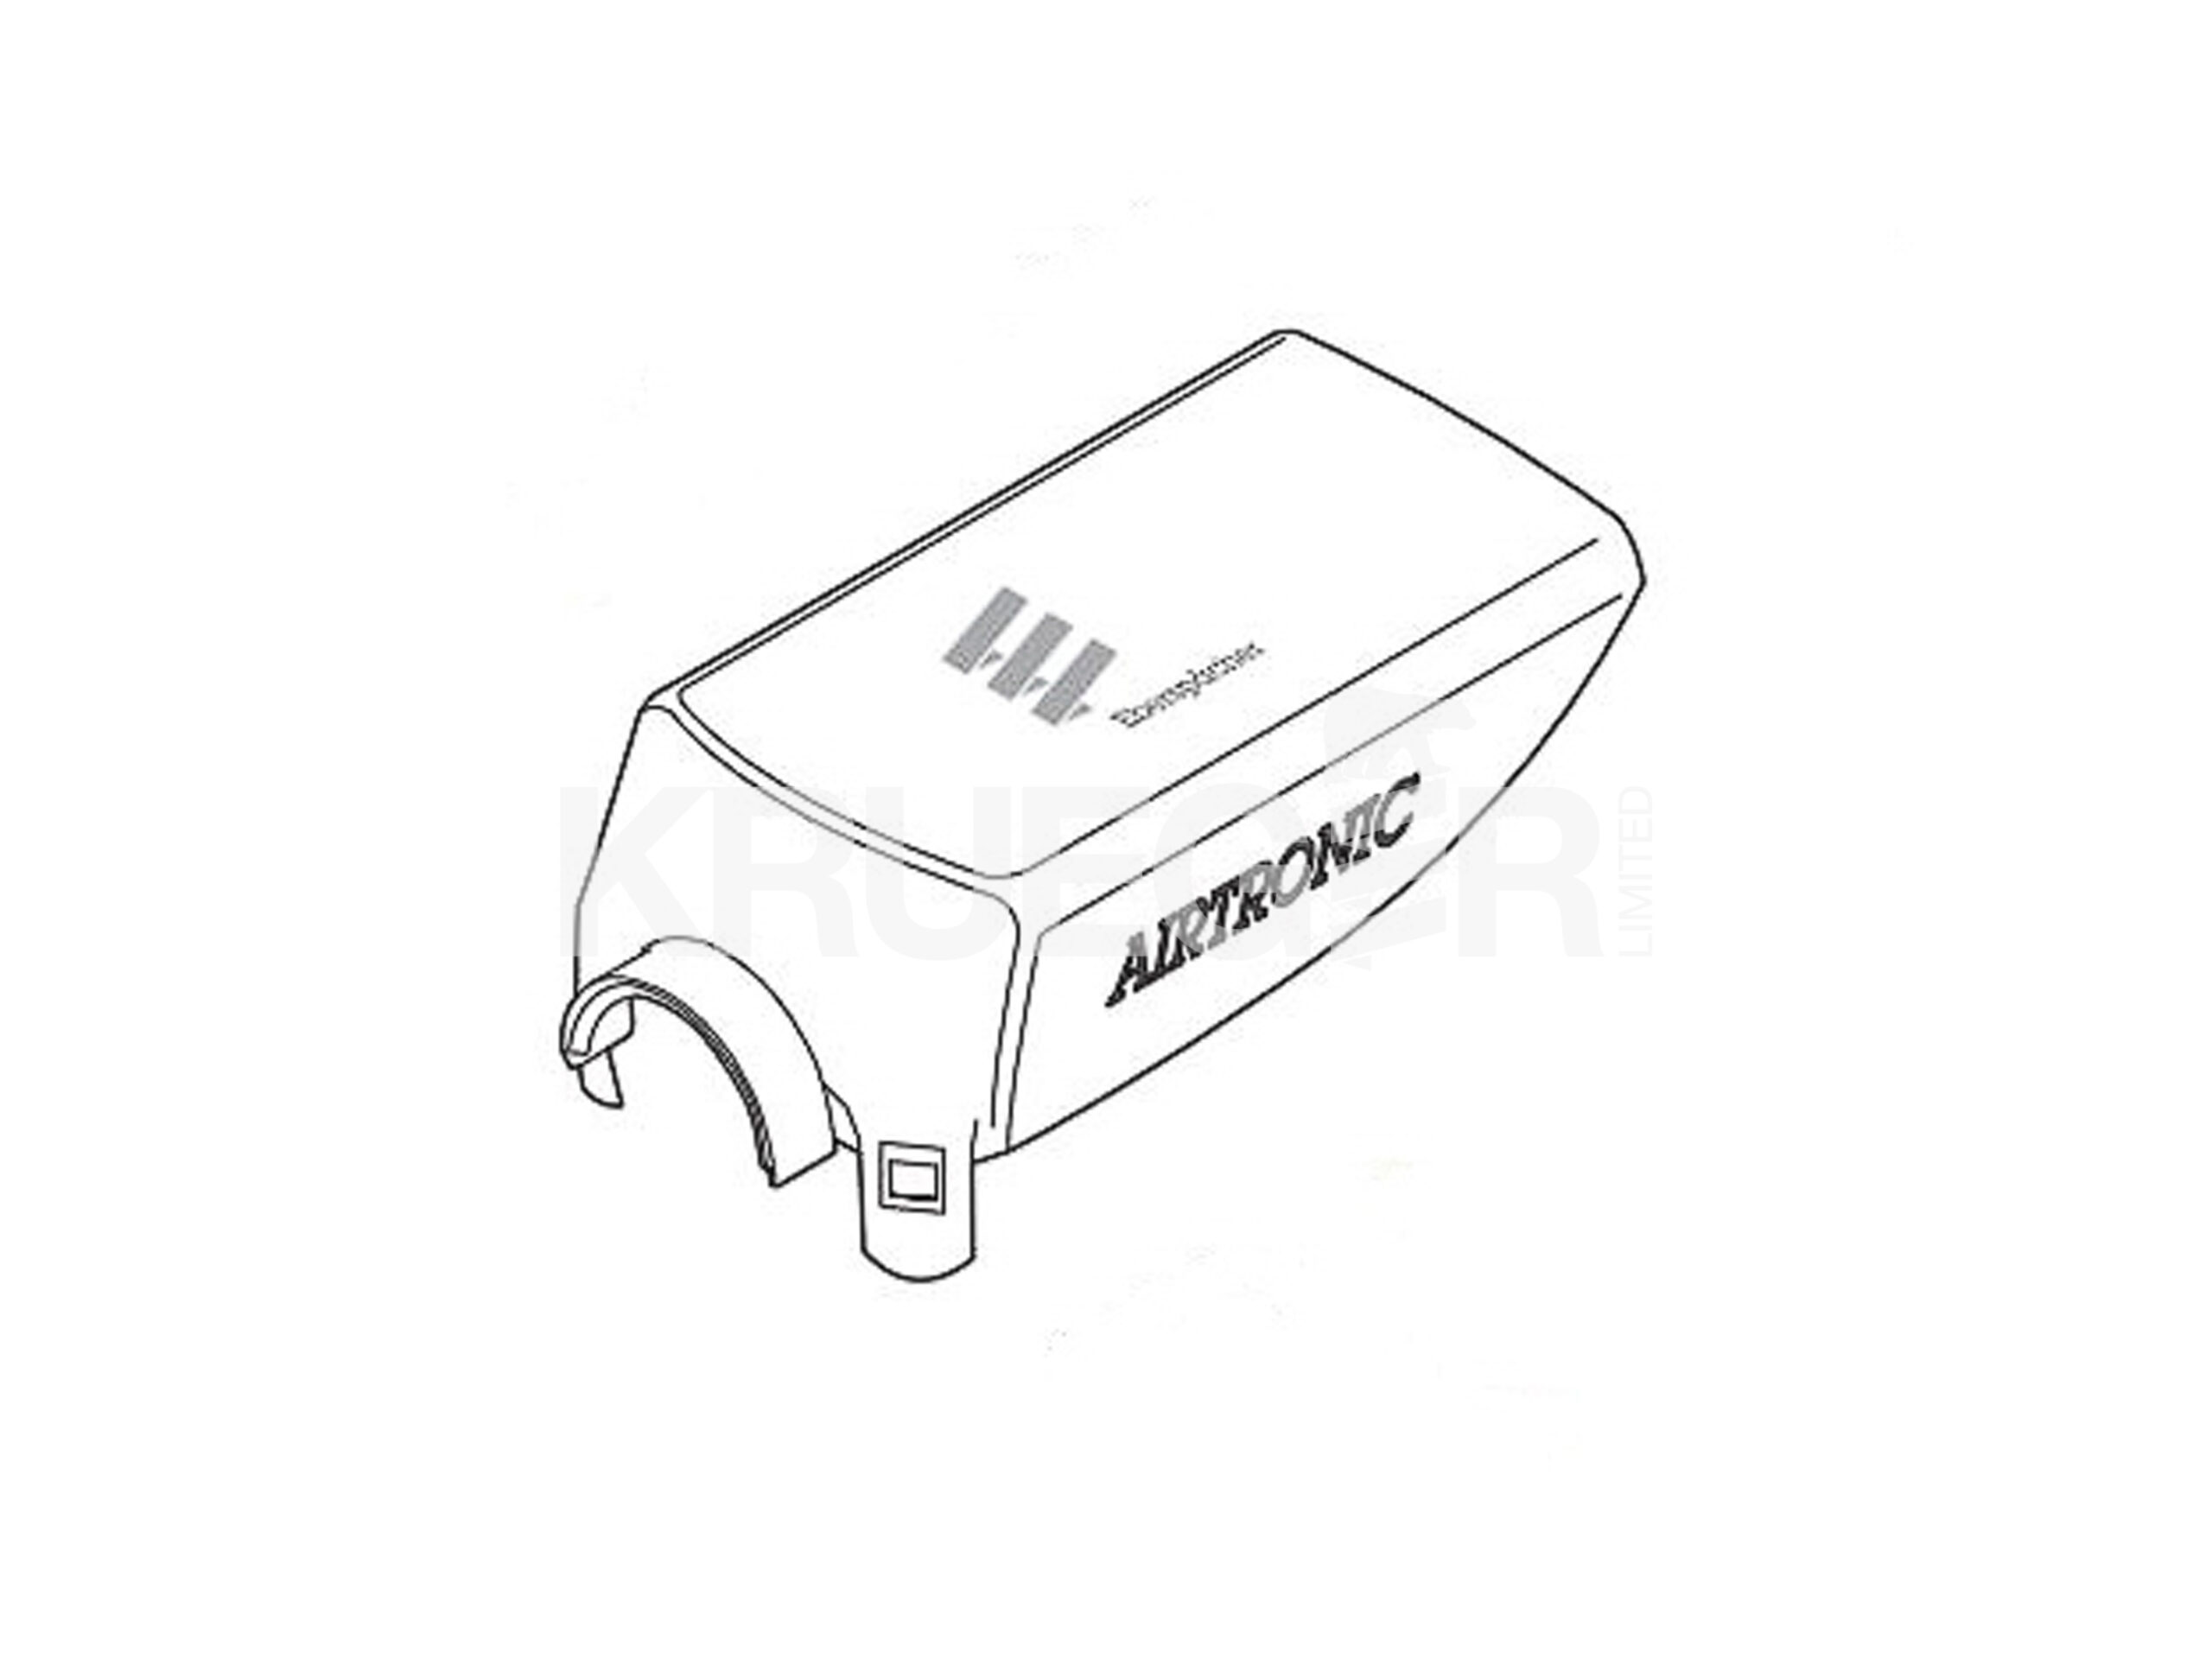 airtronic vehicle heating